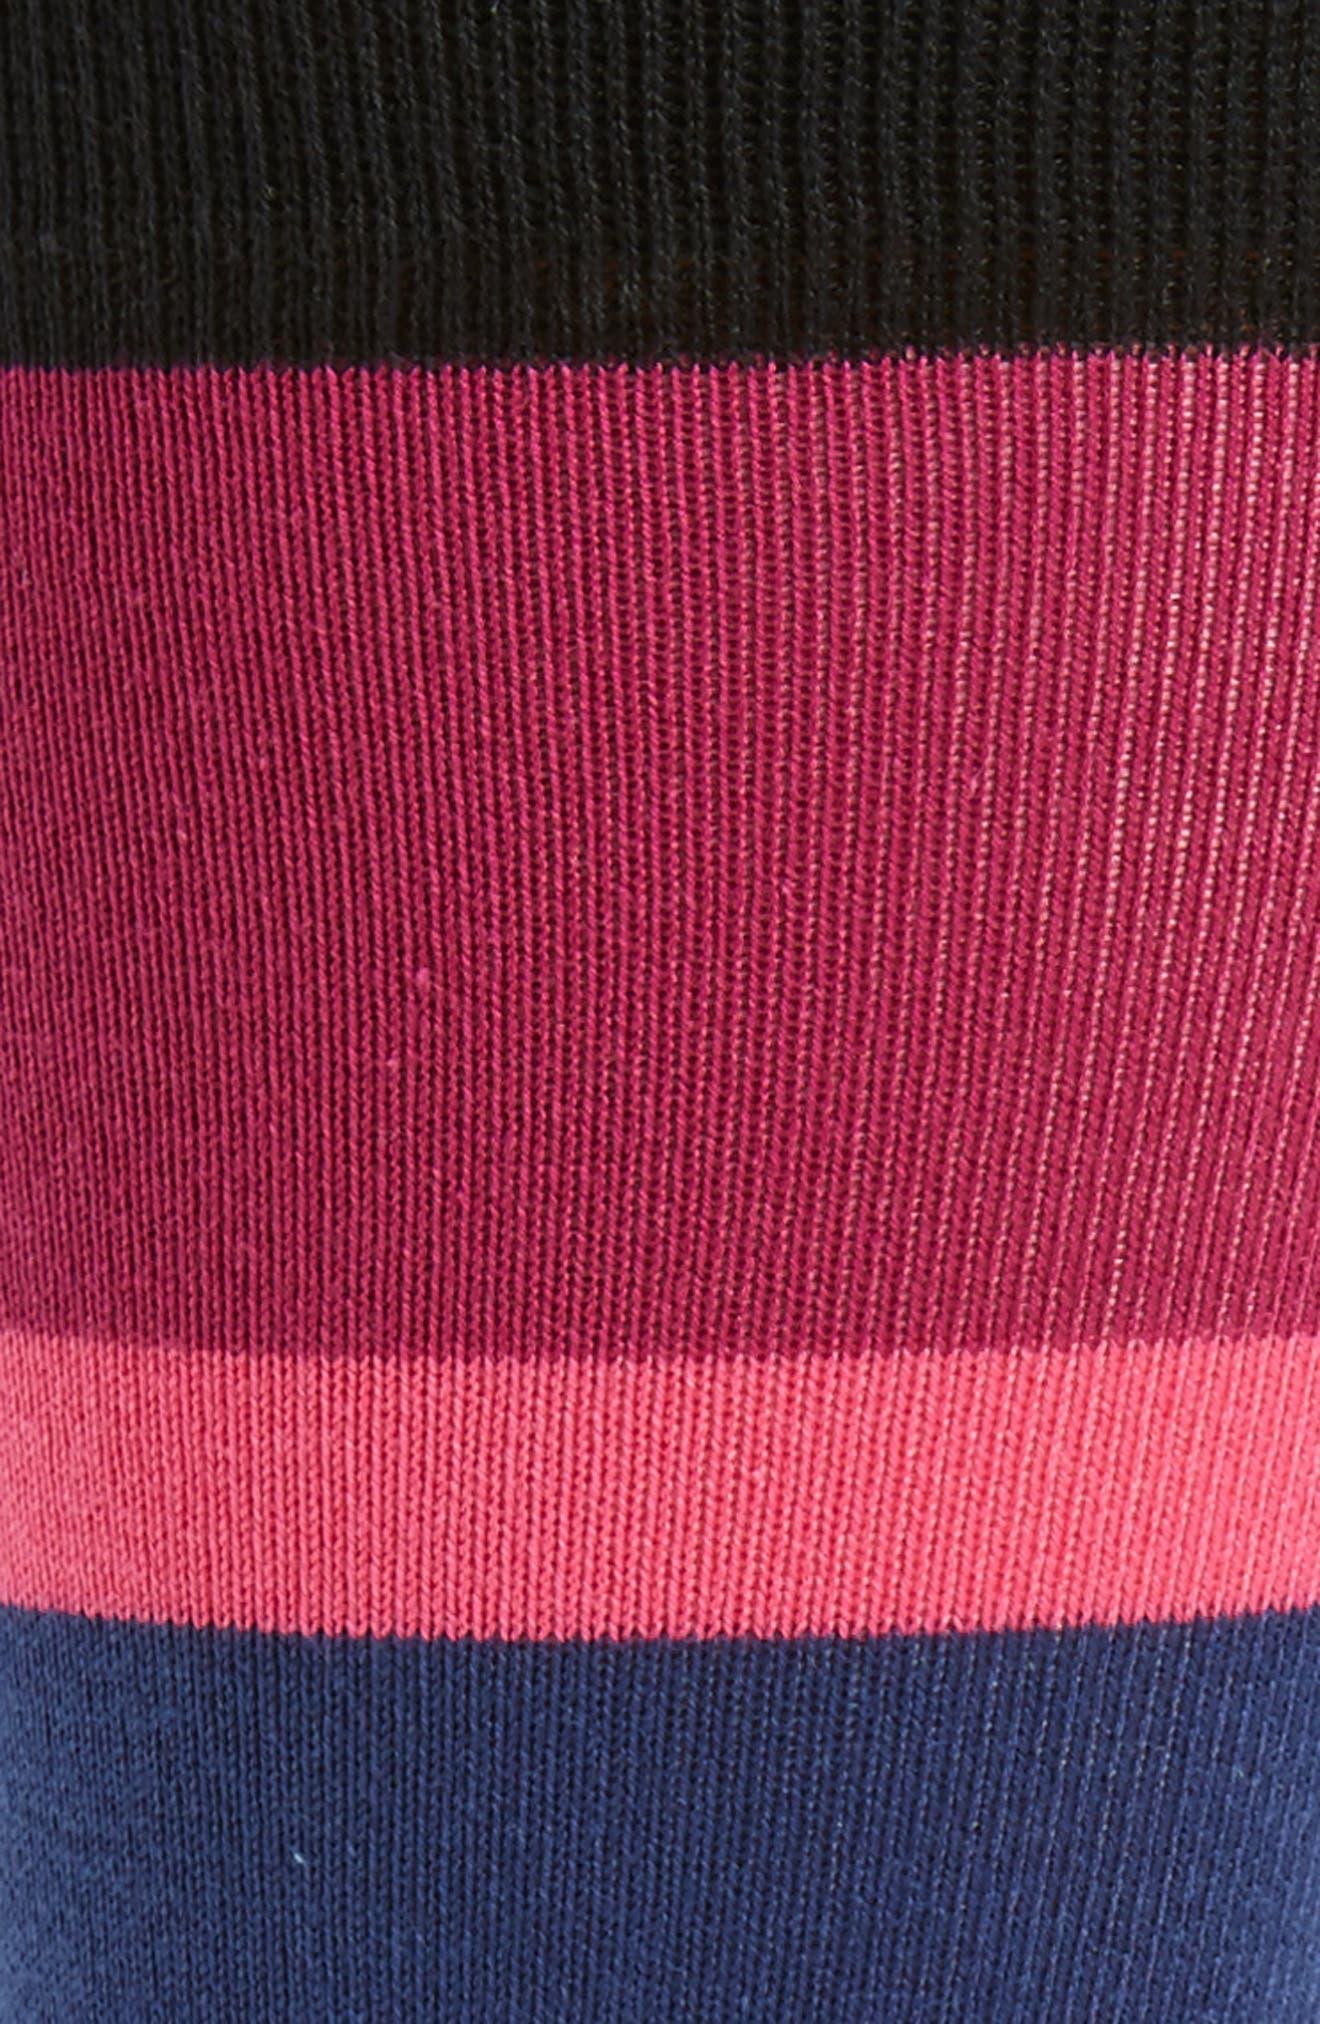 Jolly Colorblock Socks,                             Alternate thumbnail 2, color,                             Blue/ Grey Multi